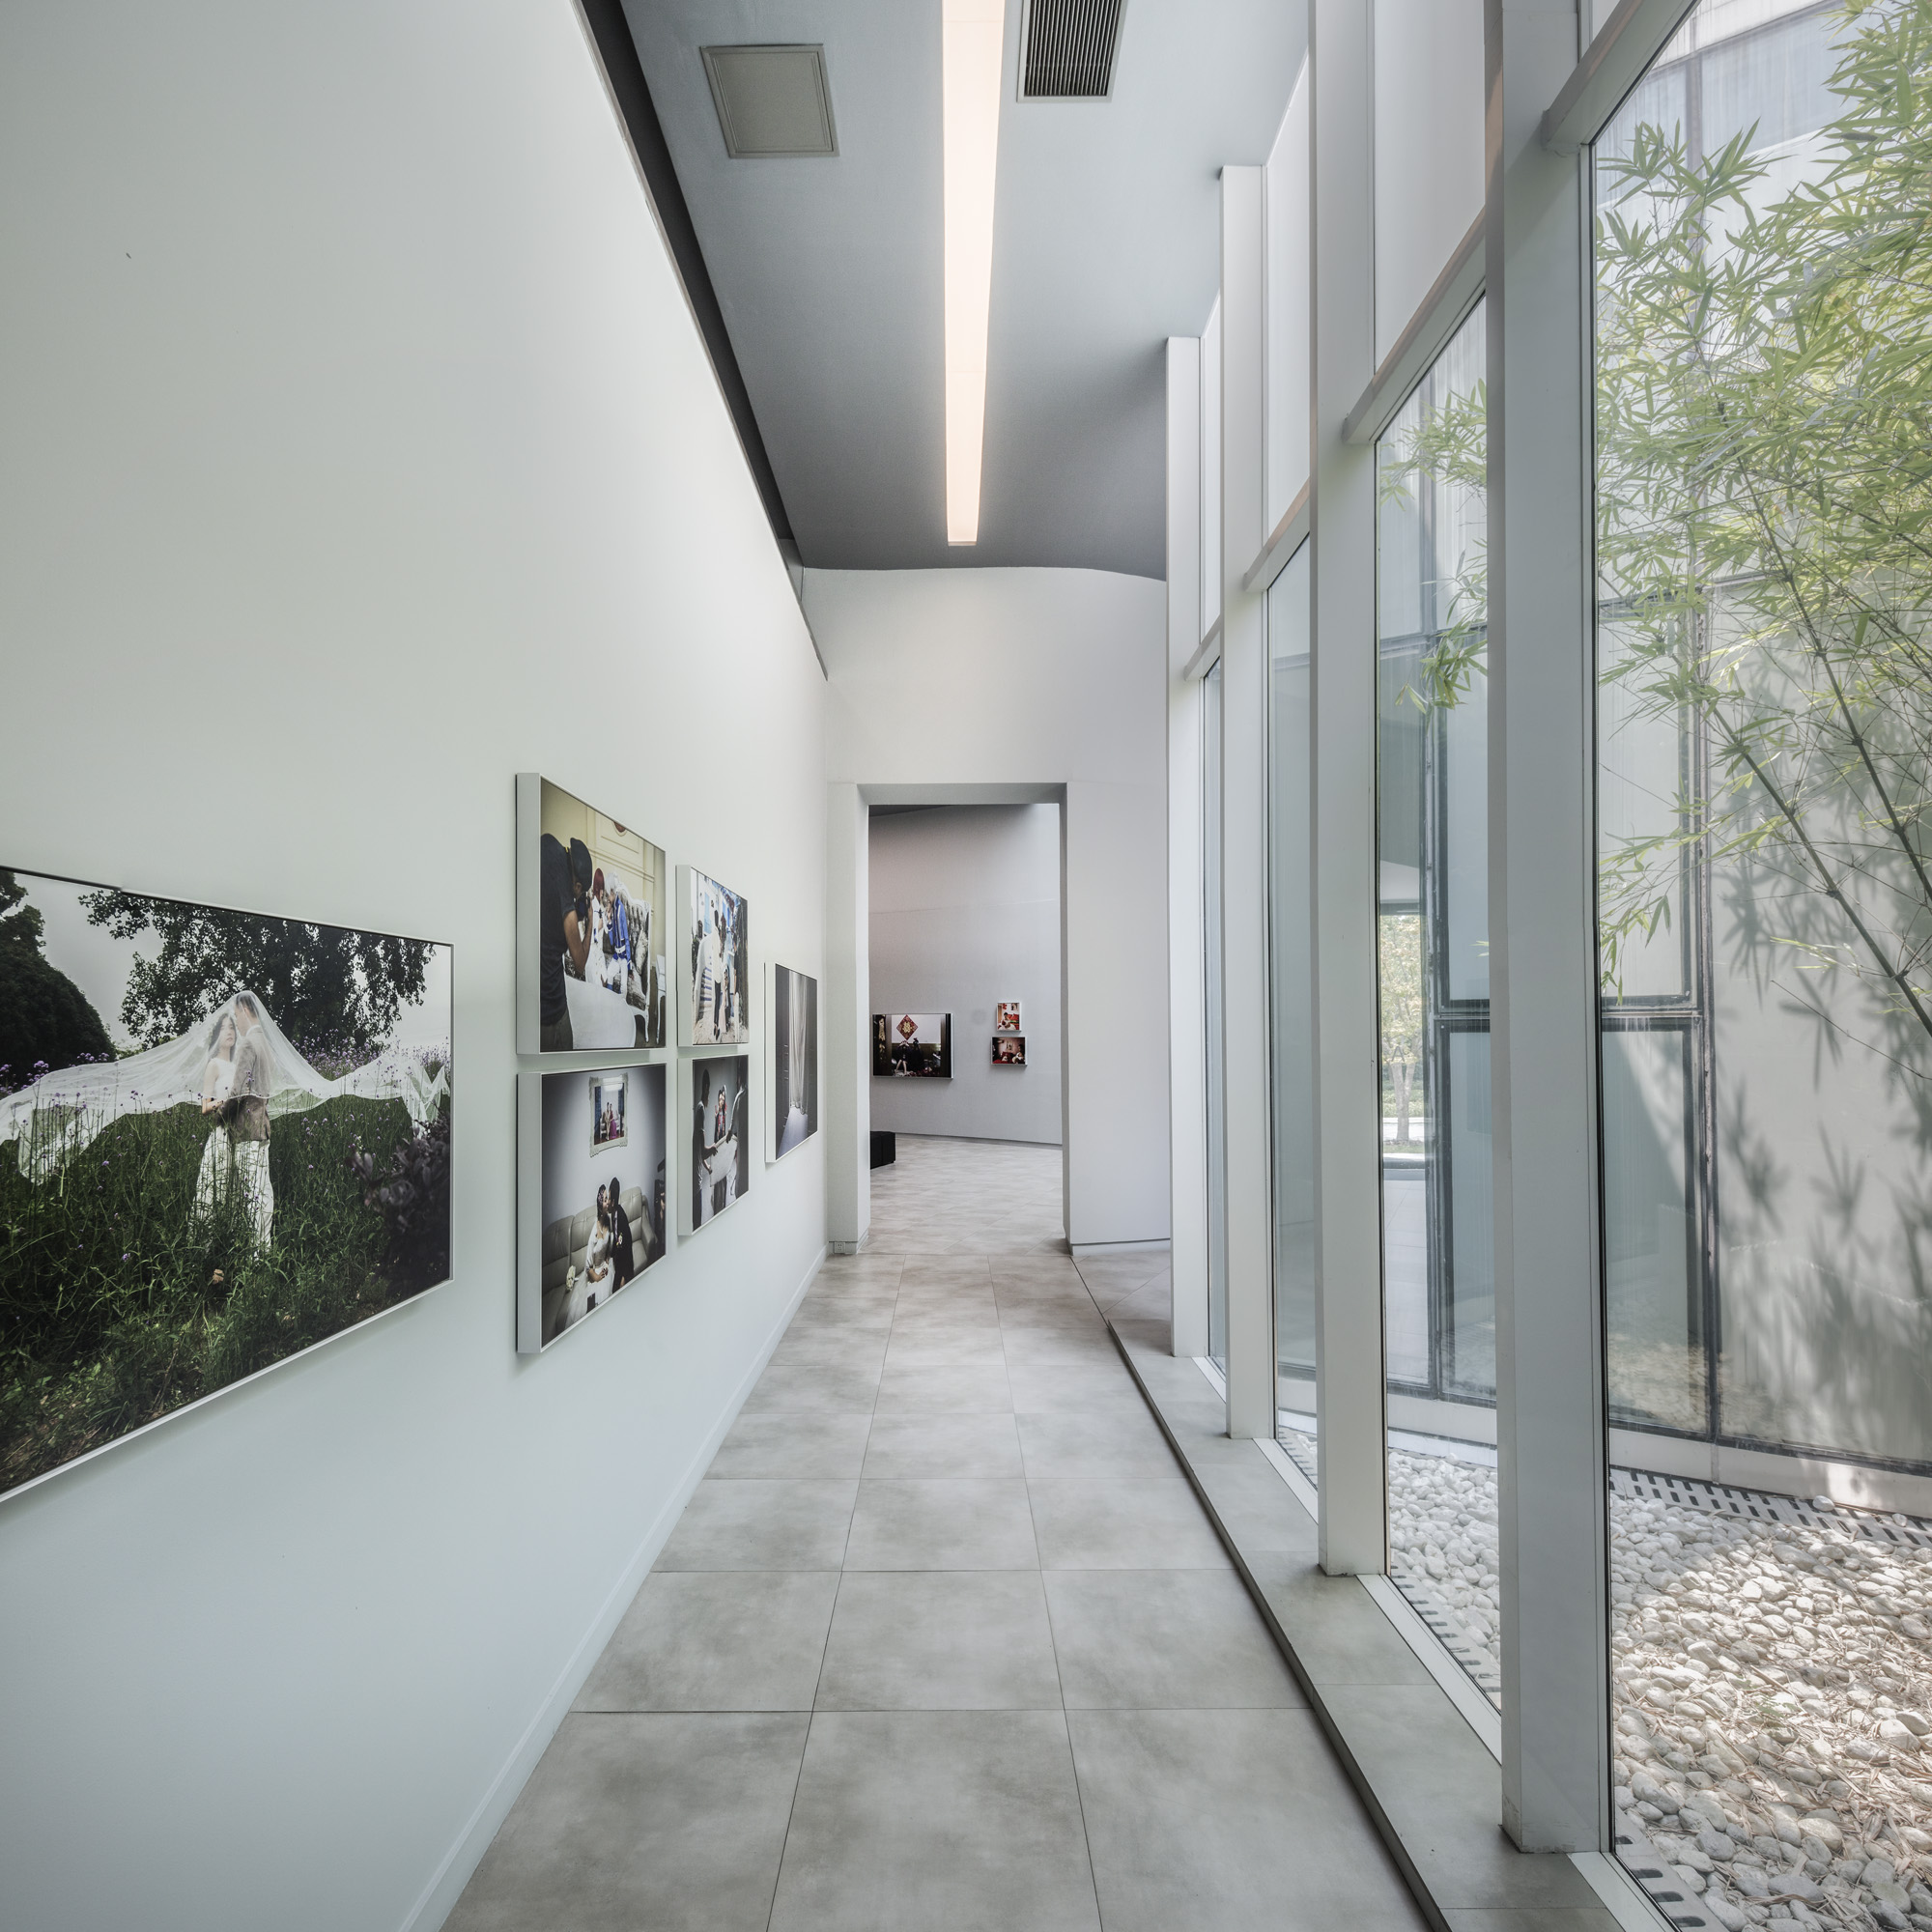 20190817_SCoP_Interior_Corridor_06©️S